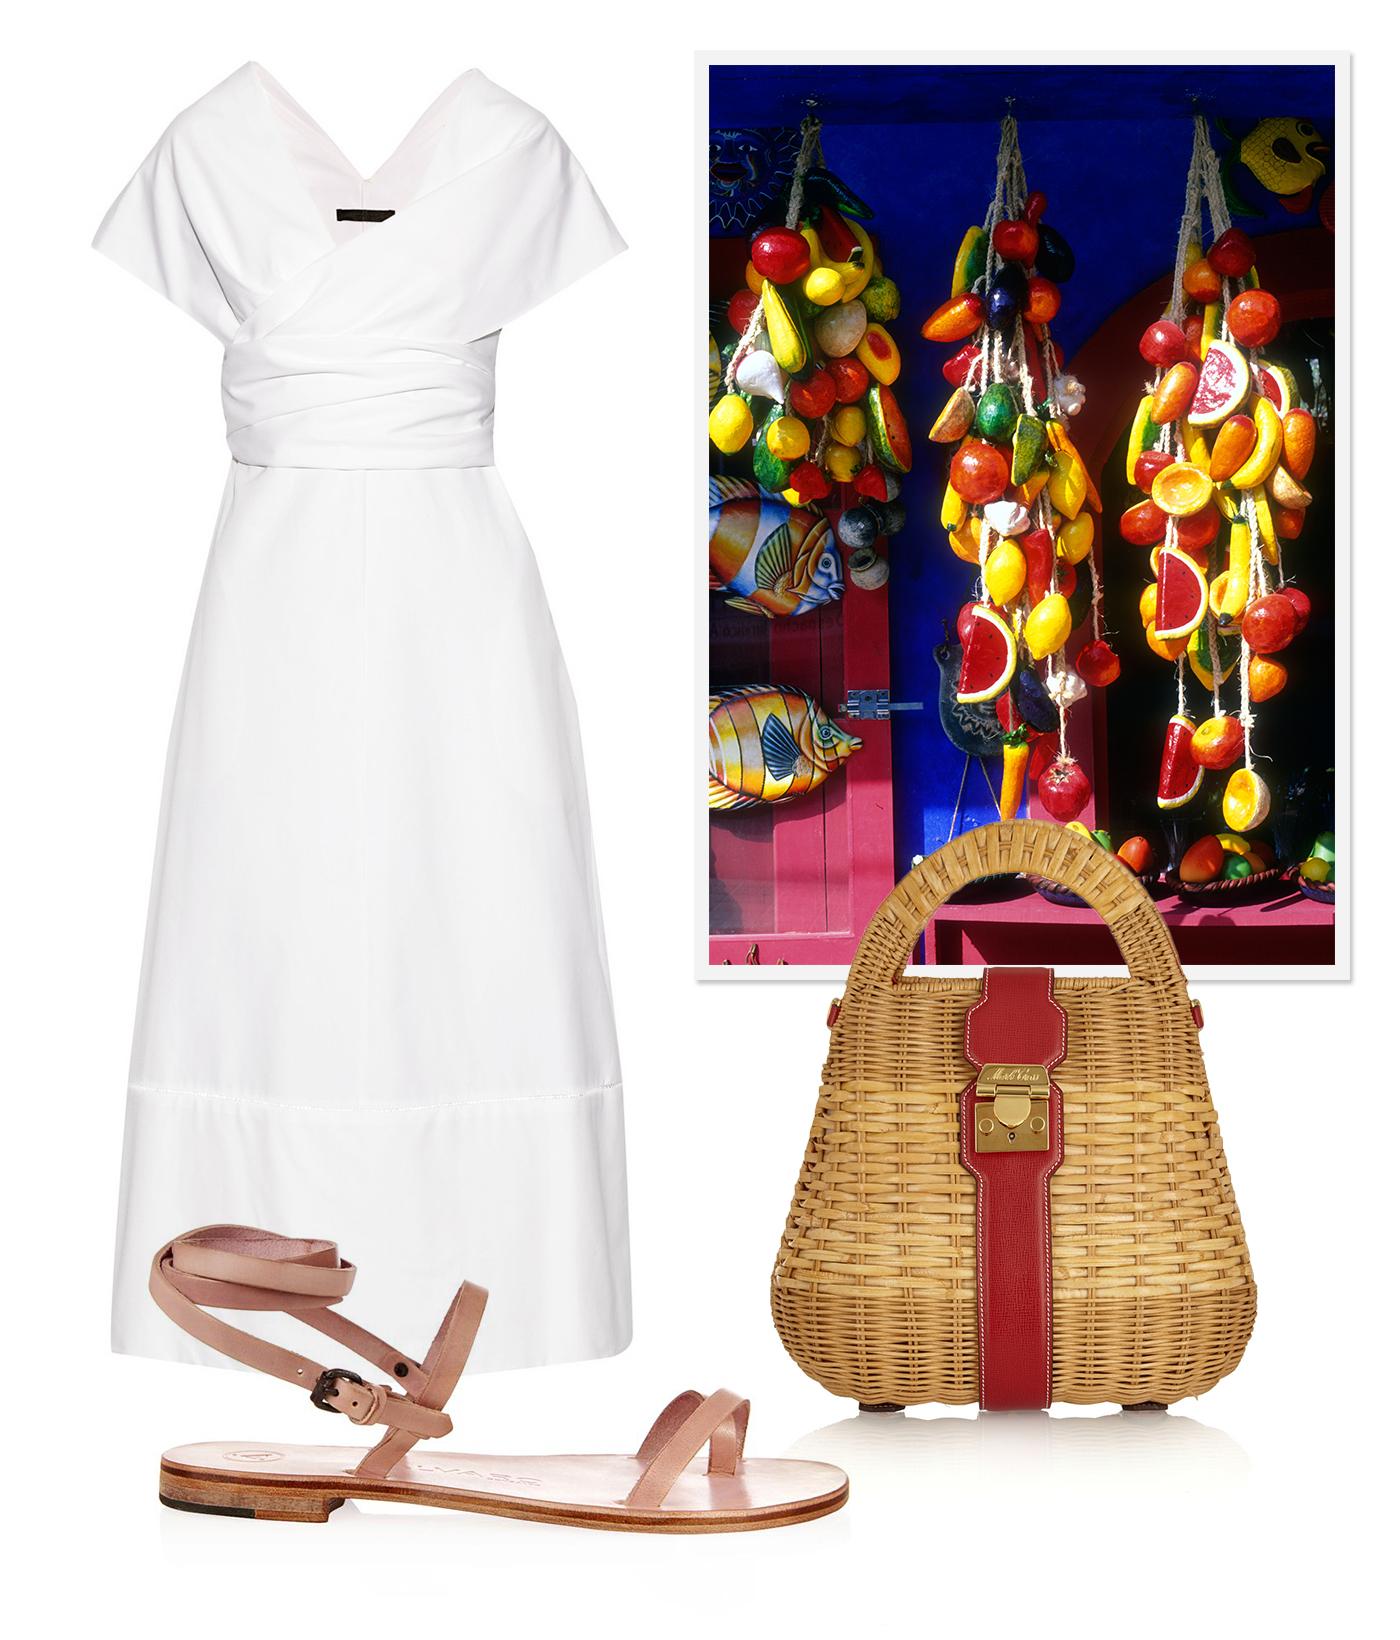 spring-break-outfit-inspiration-08.jpg